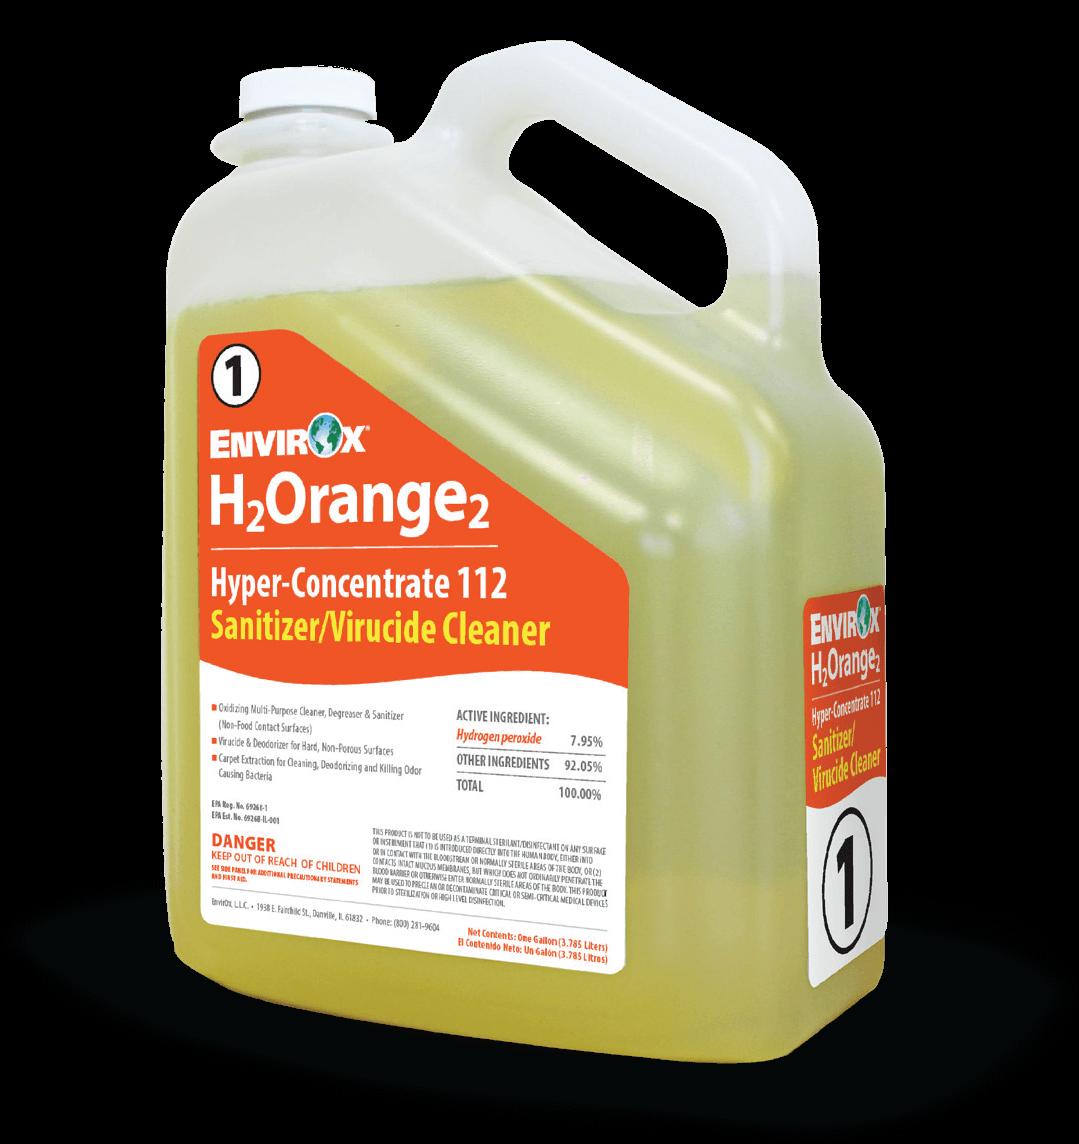 Envirox H2Orange2